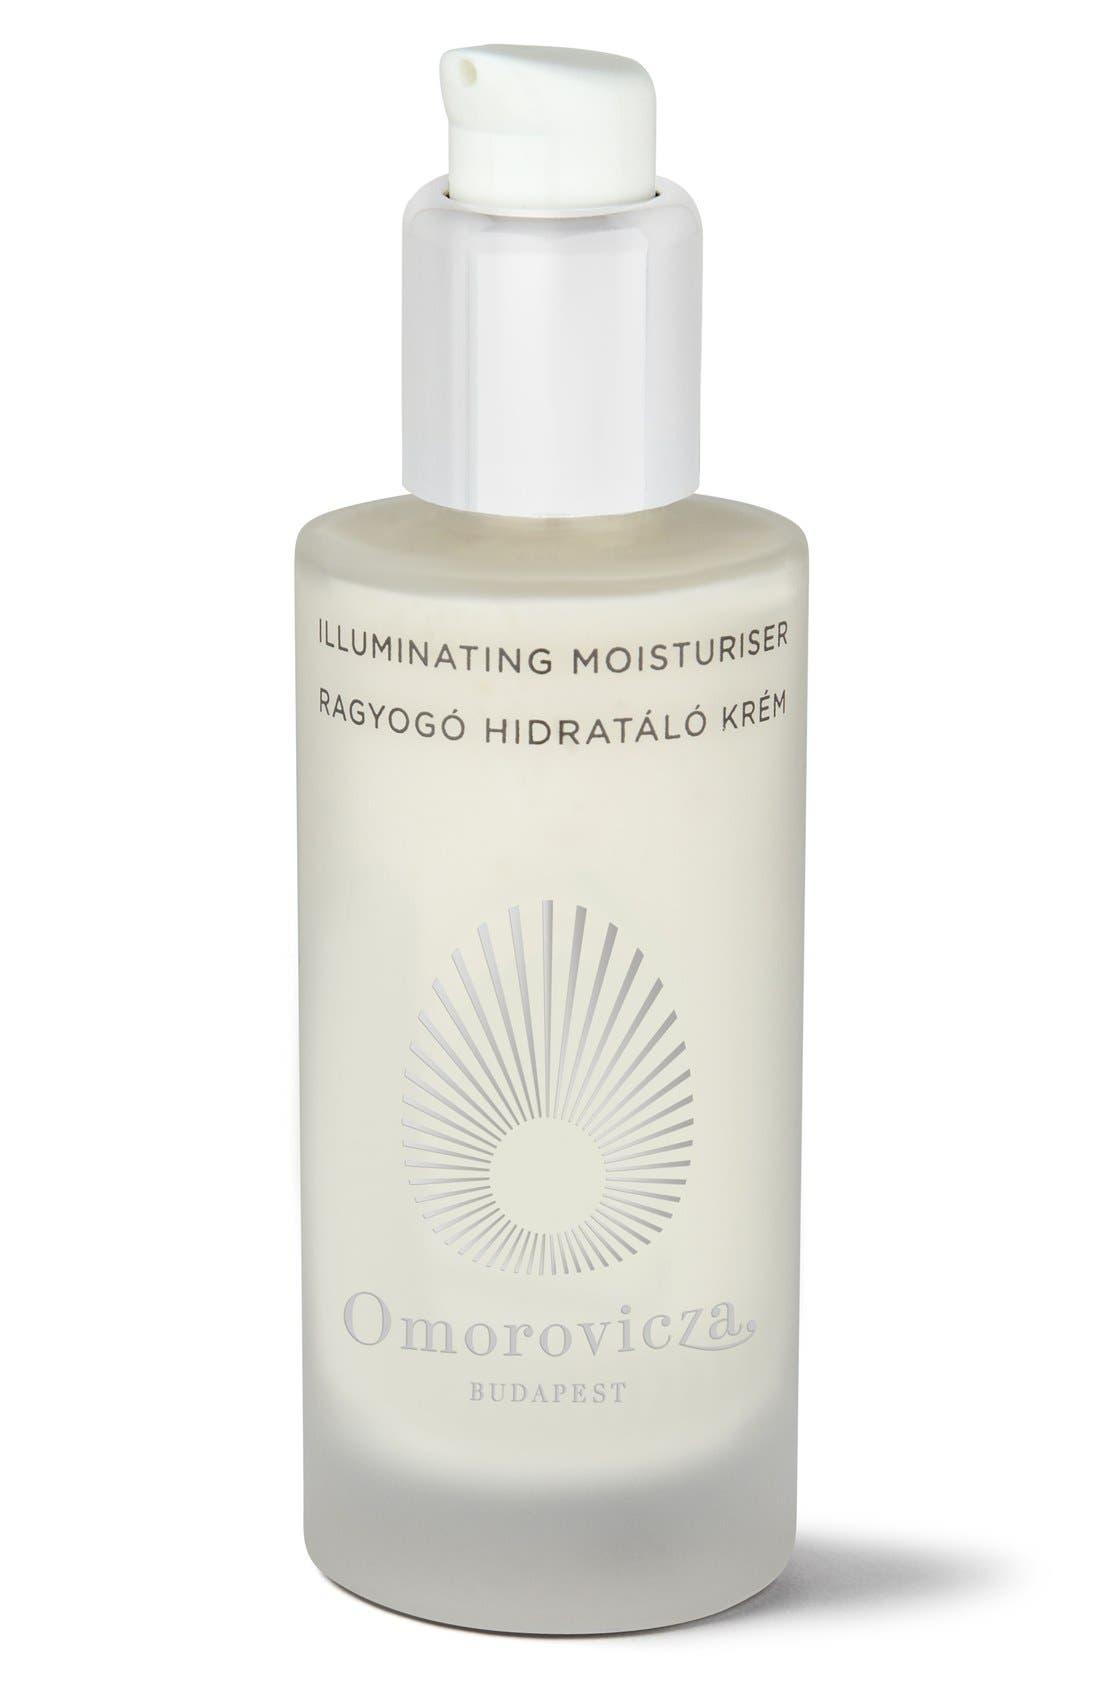 Omorovicza Illuminating Moisturizer